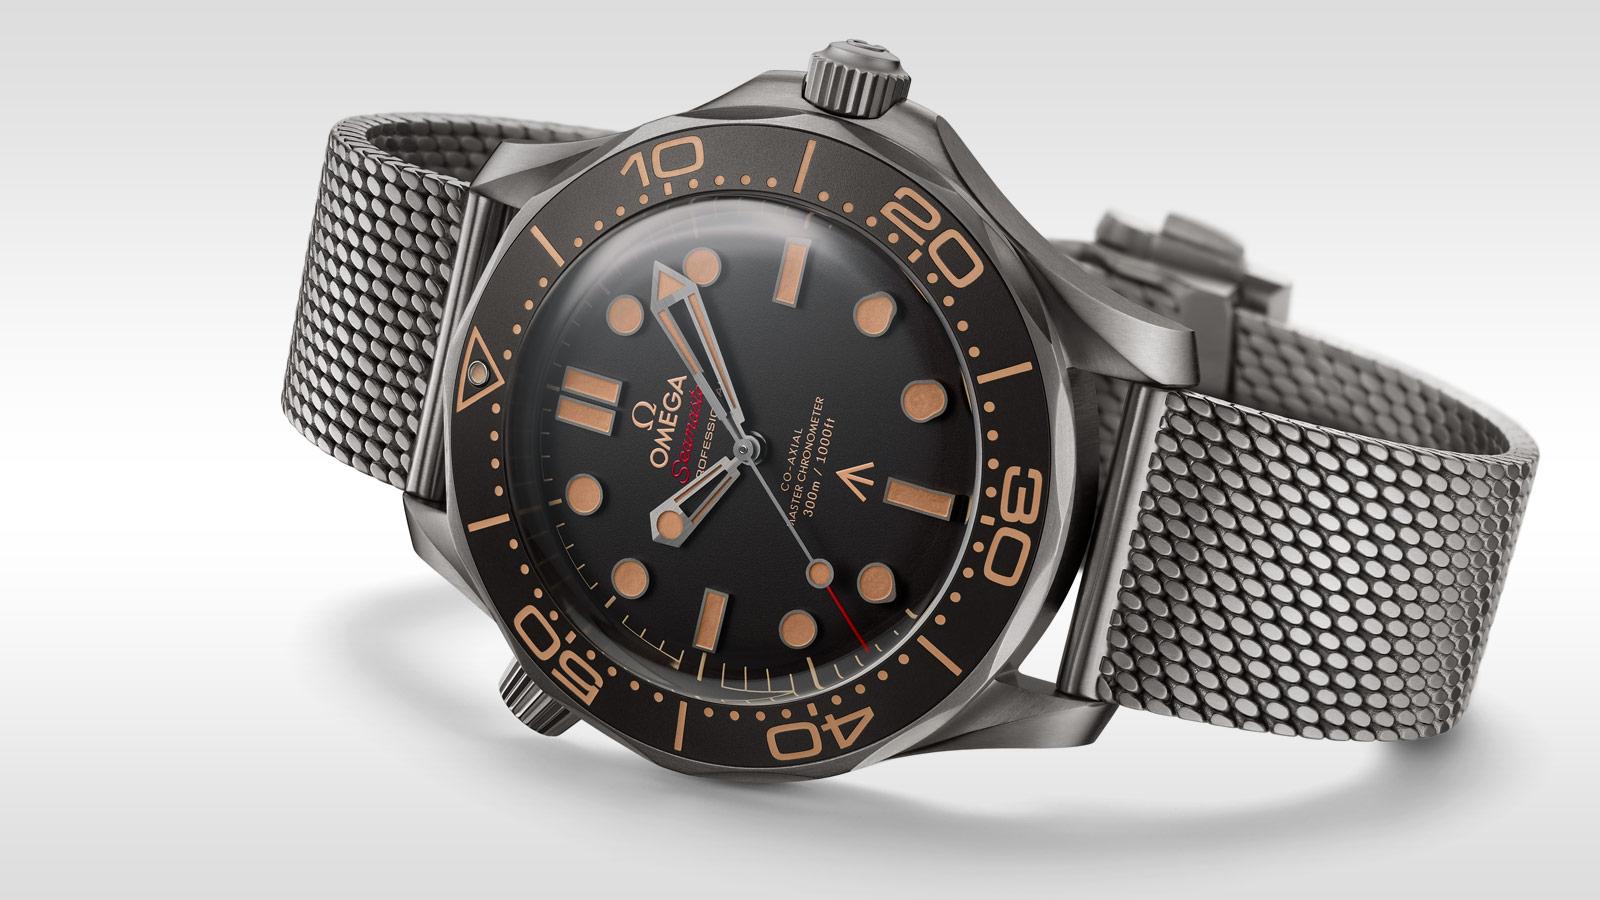 Seamaster 300米潜水表 300米潜水表 欧米茄同轴•至臻天文台表42毫米 - 210.90.42.20.01.001 - 查看 5